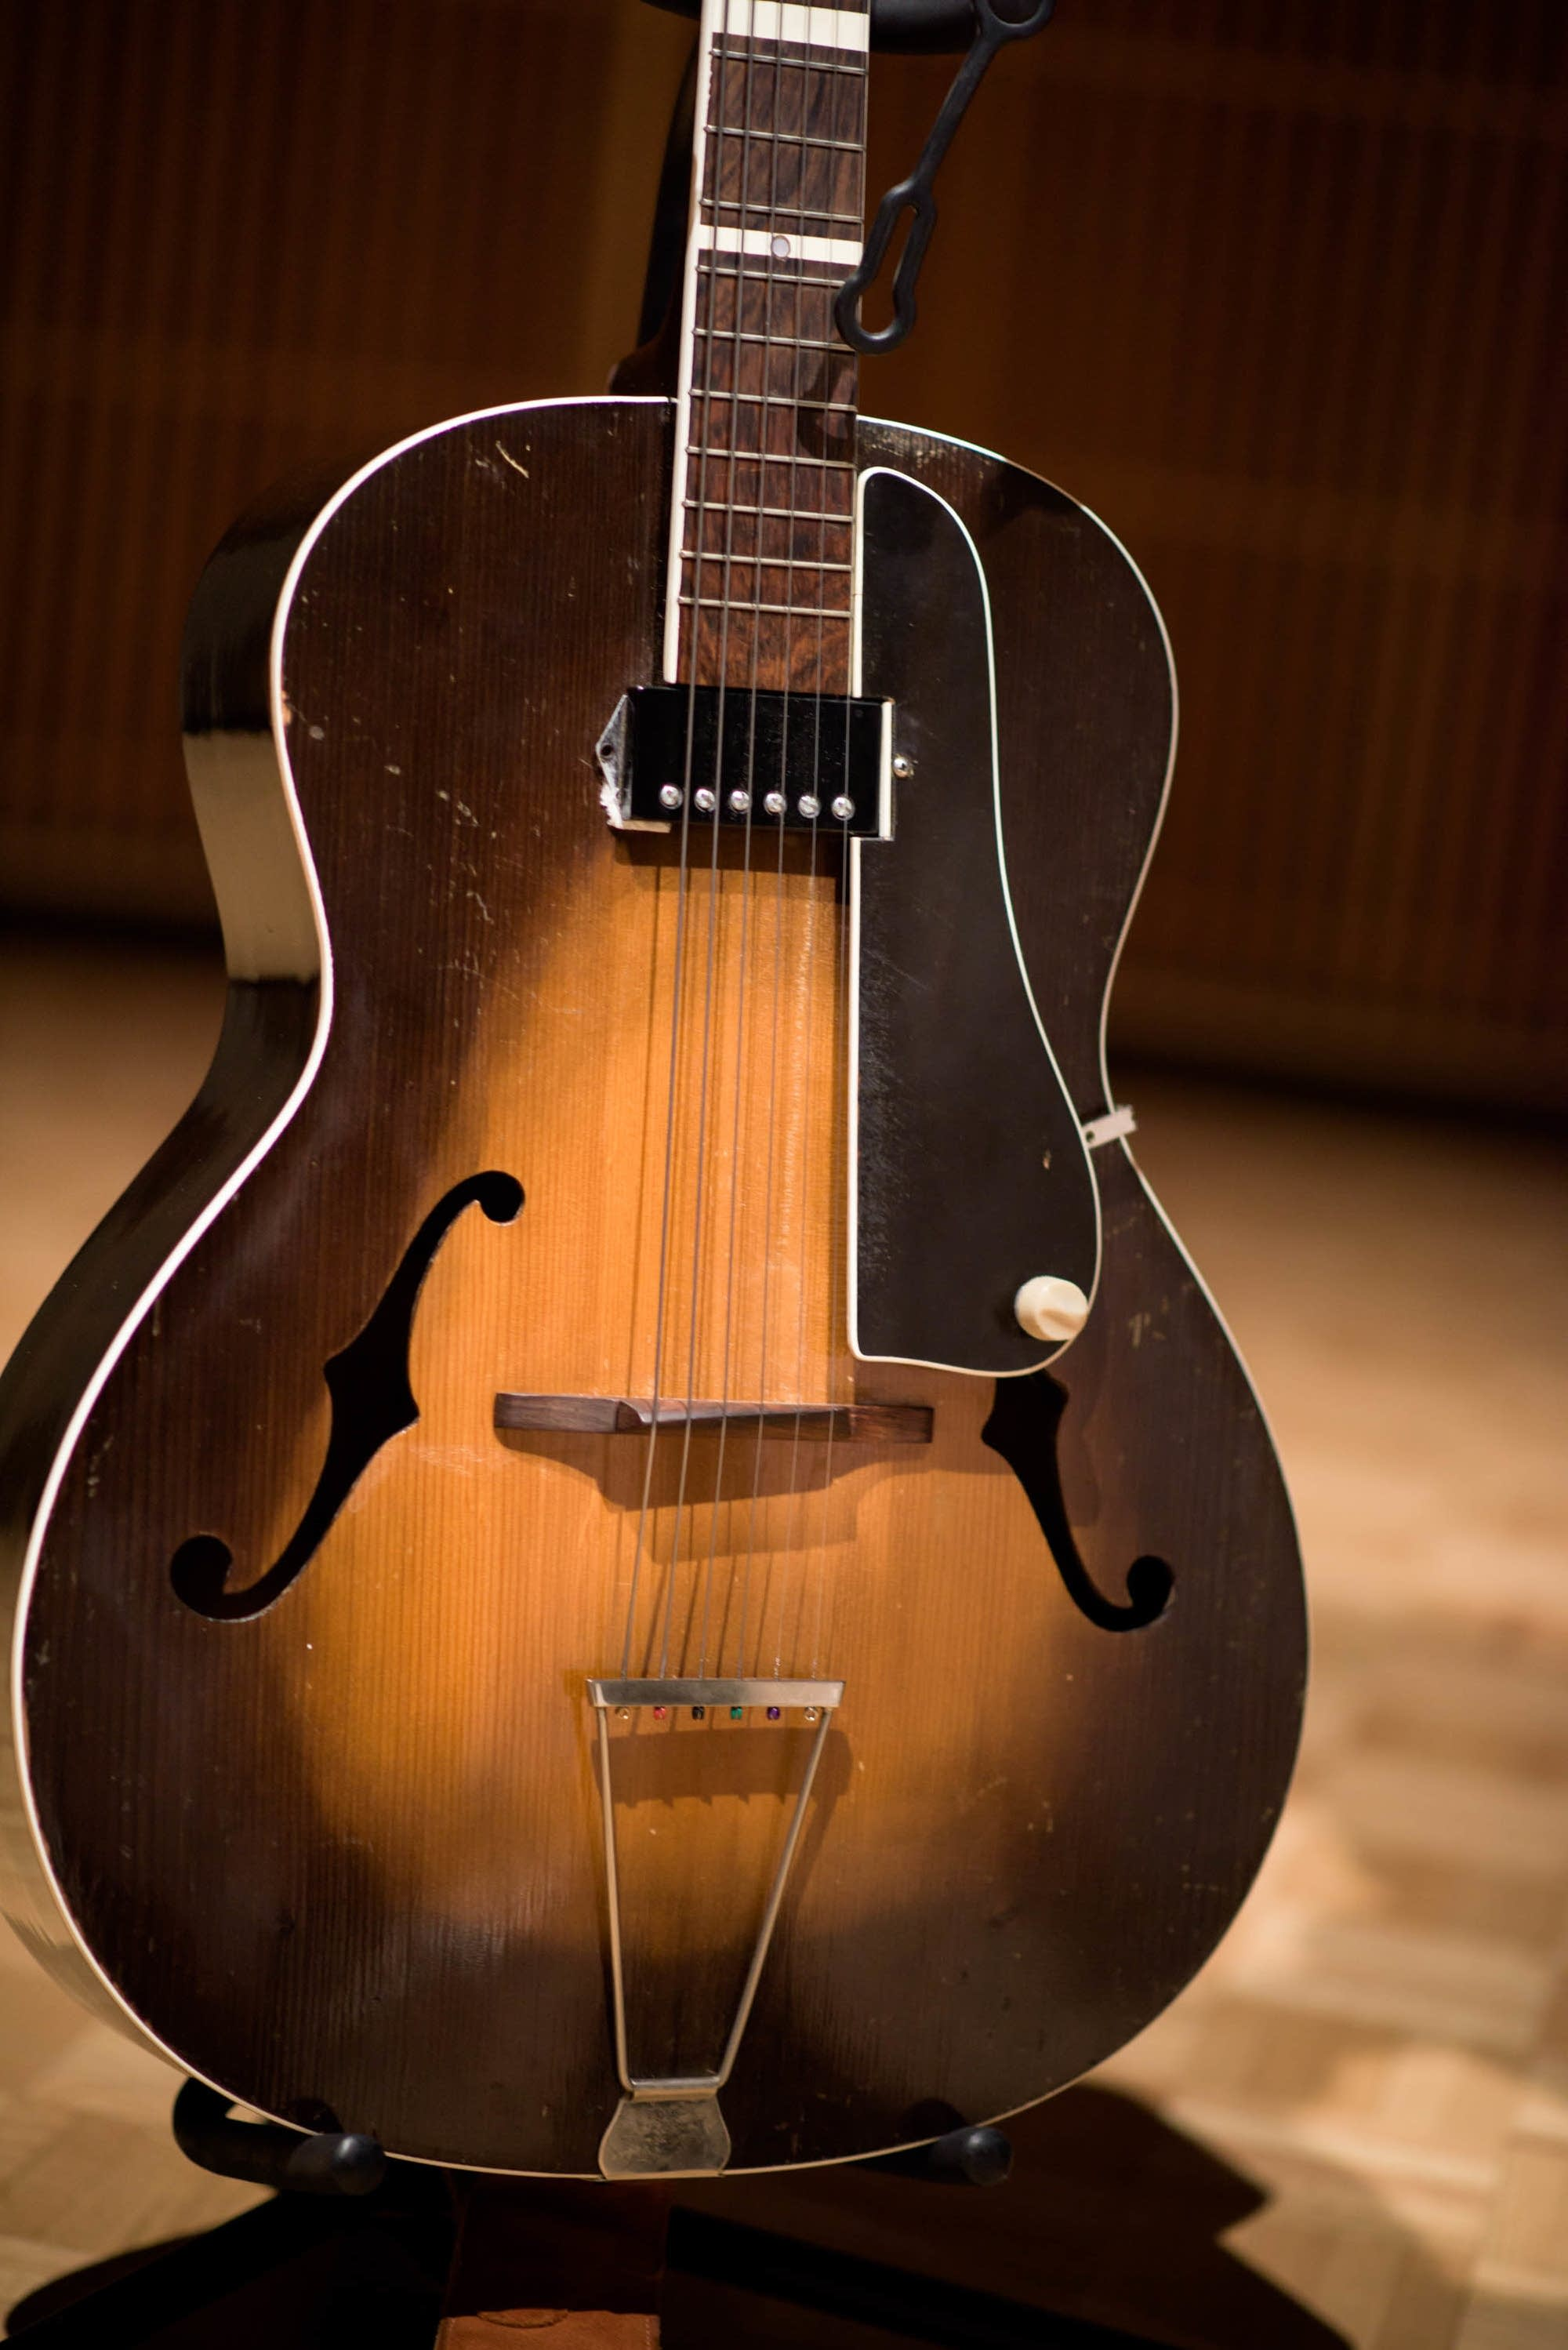 1956 Yngve Barslev Jazz Guitar